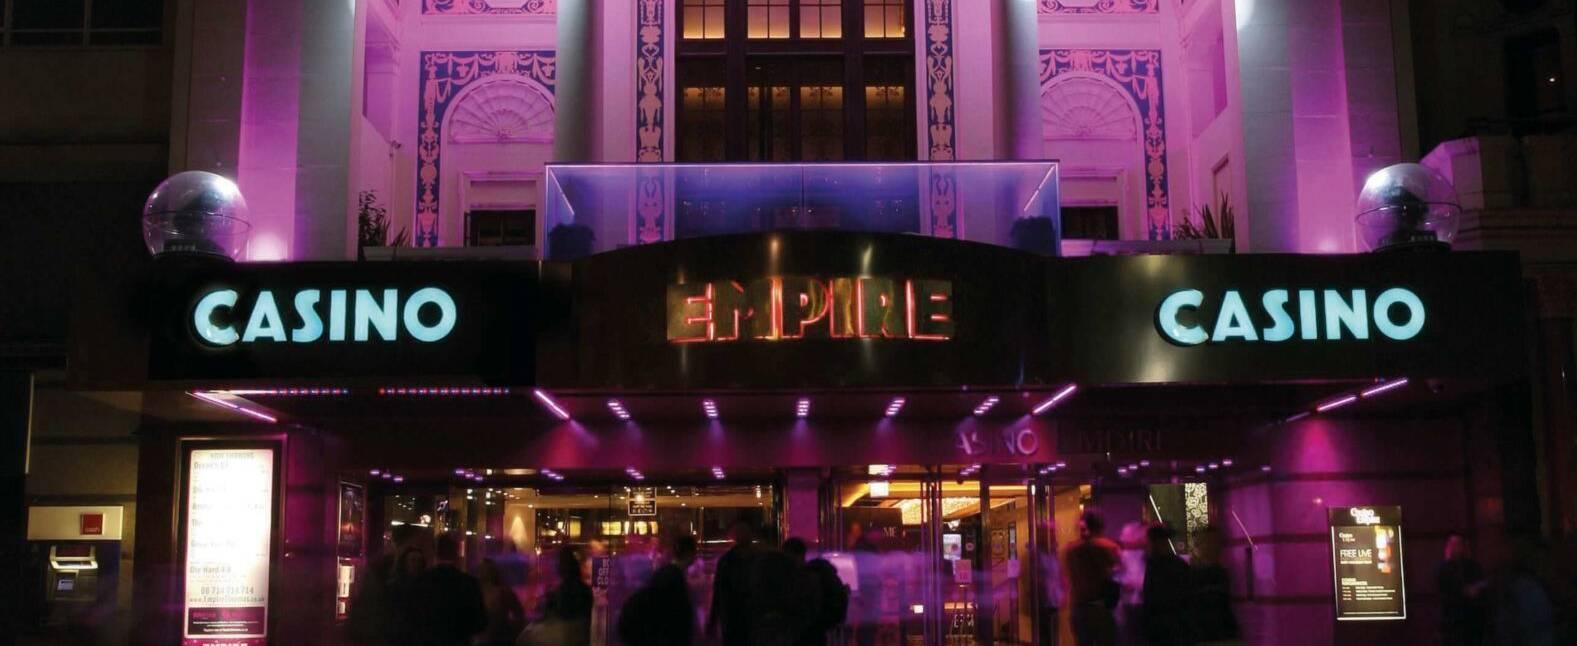 Casino LSQ Exterior High Res Retouched 1